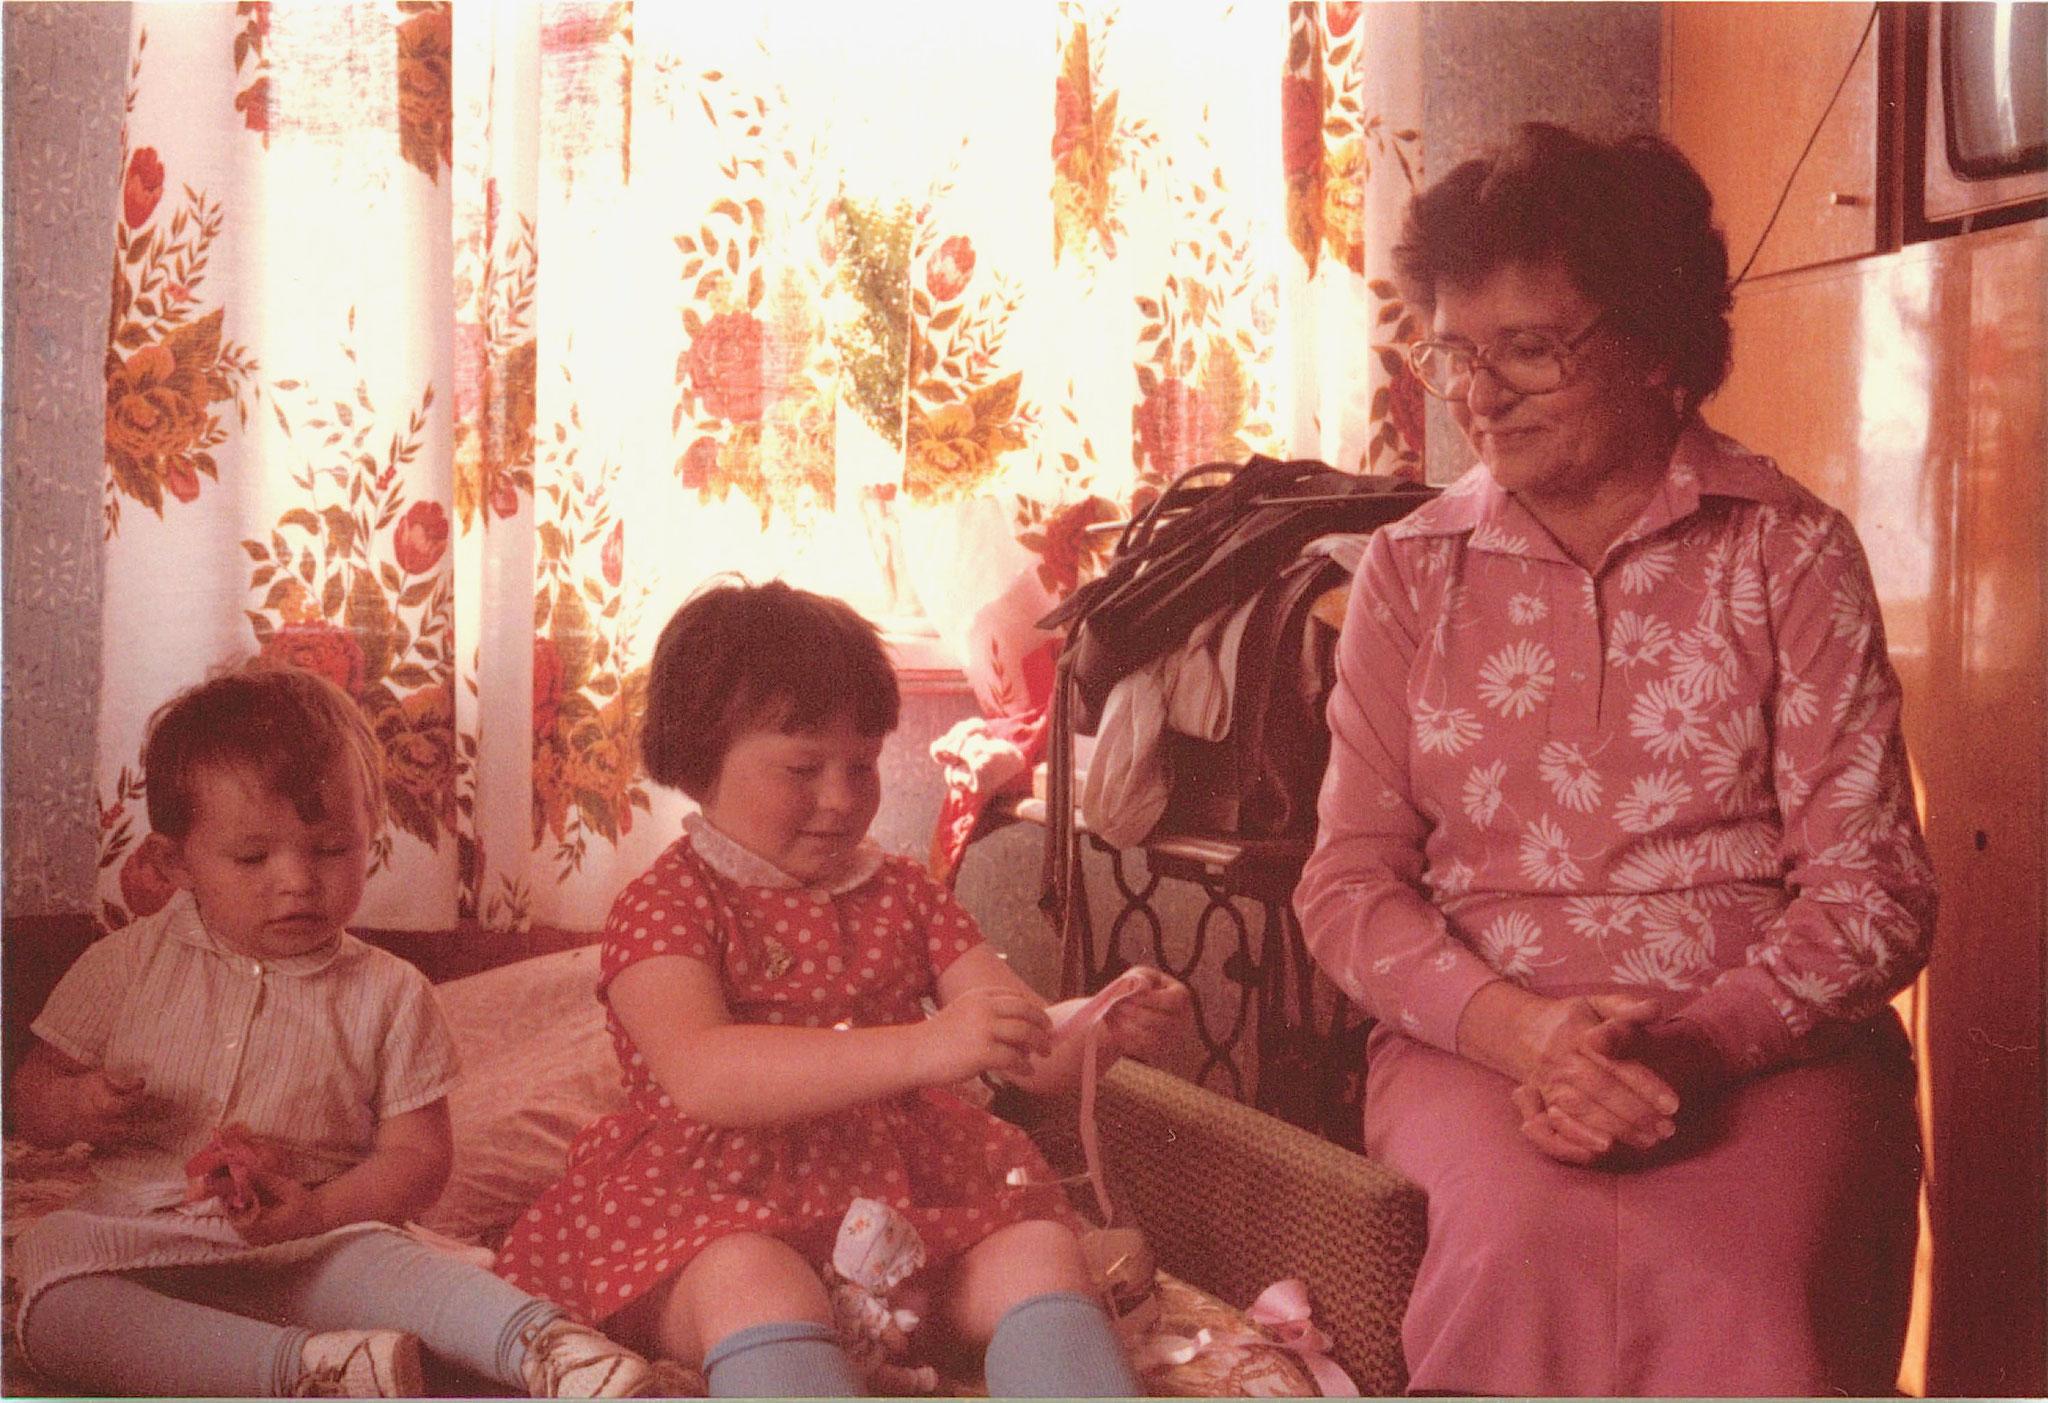 Ala & Irena with Mayme Baldyga, 1978, Rzemien, Poland